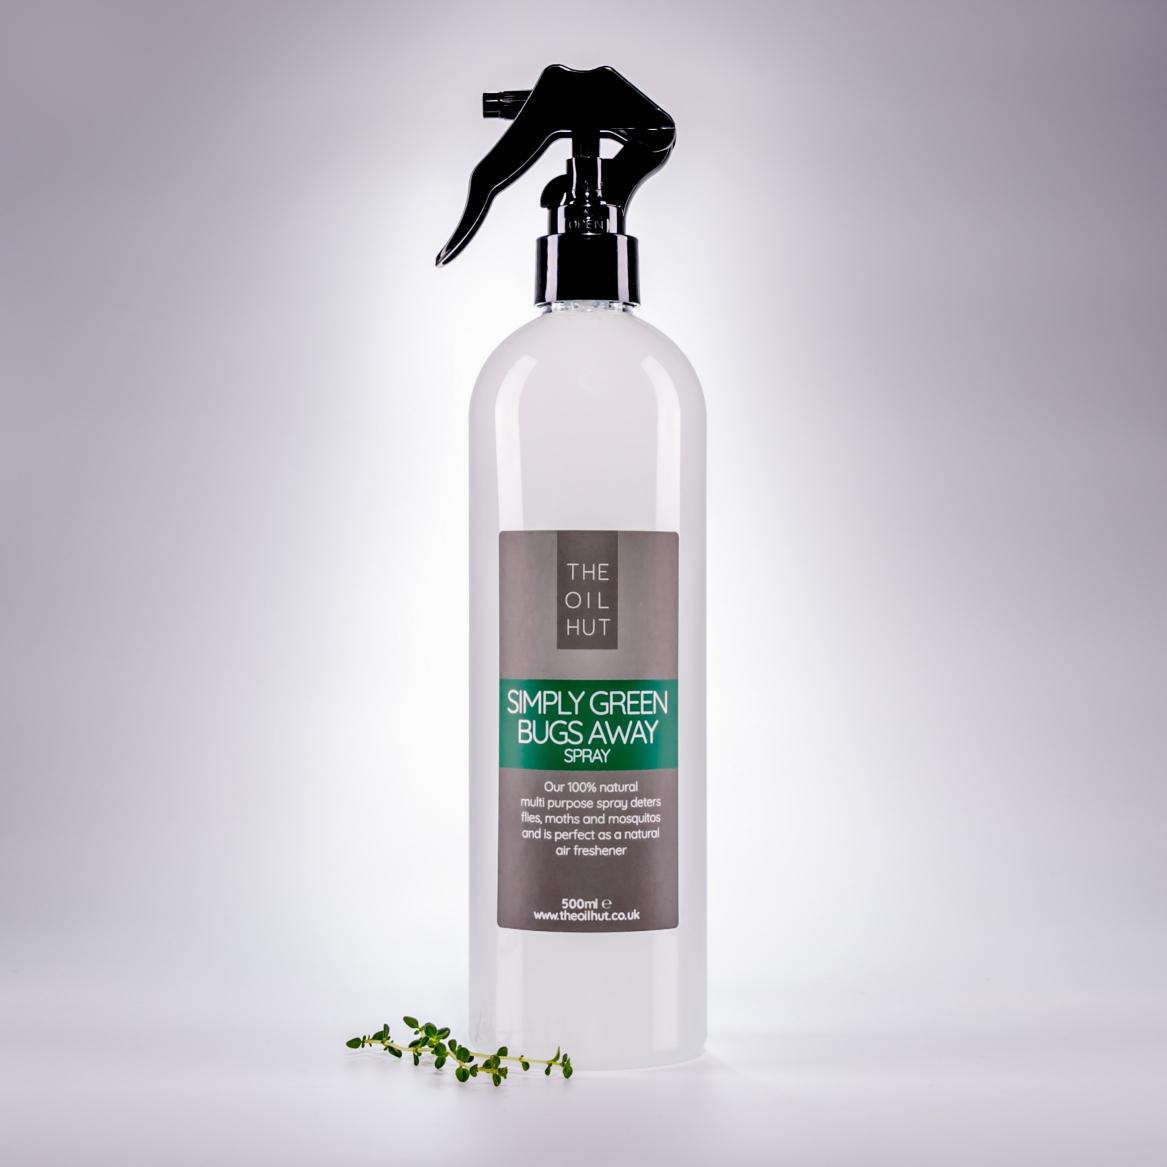 Simply Green Bugs Away Big Spray 500ml - Oil Hut